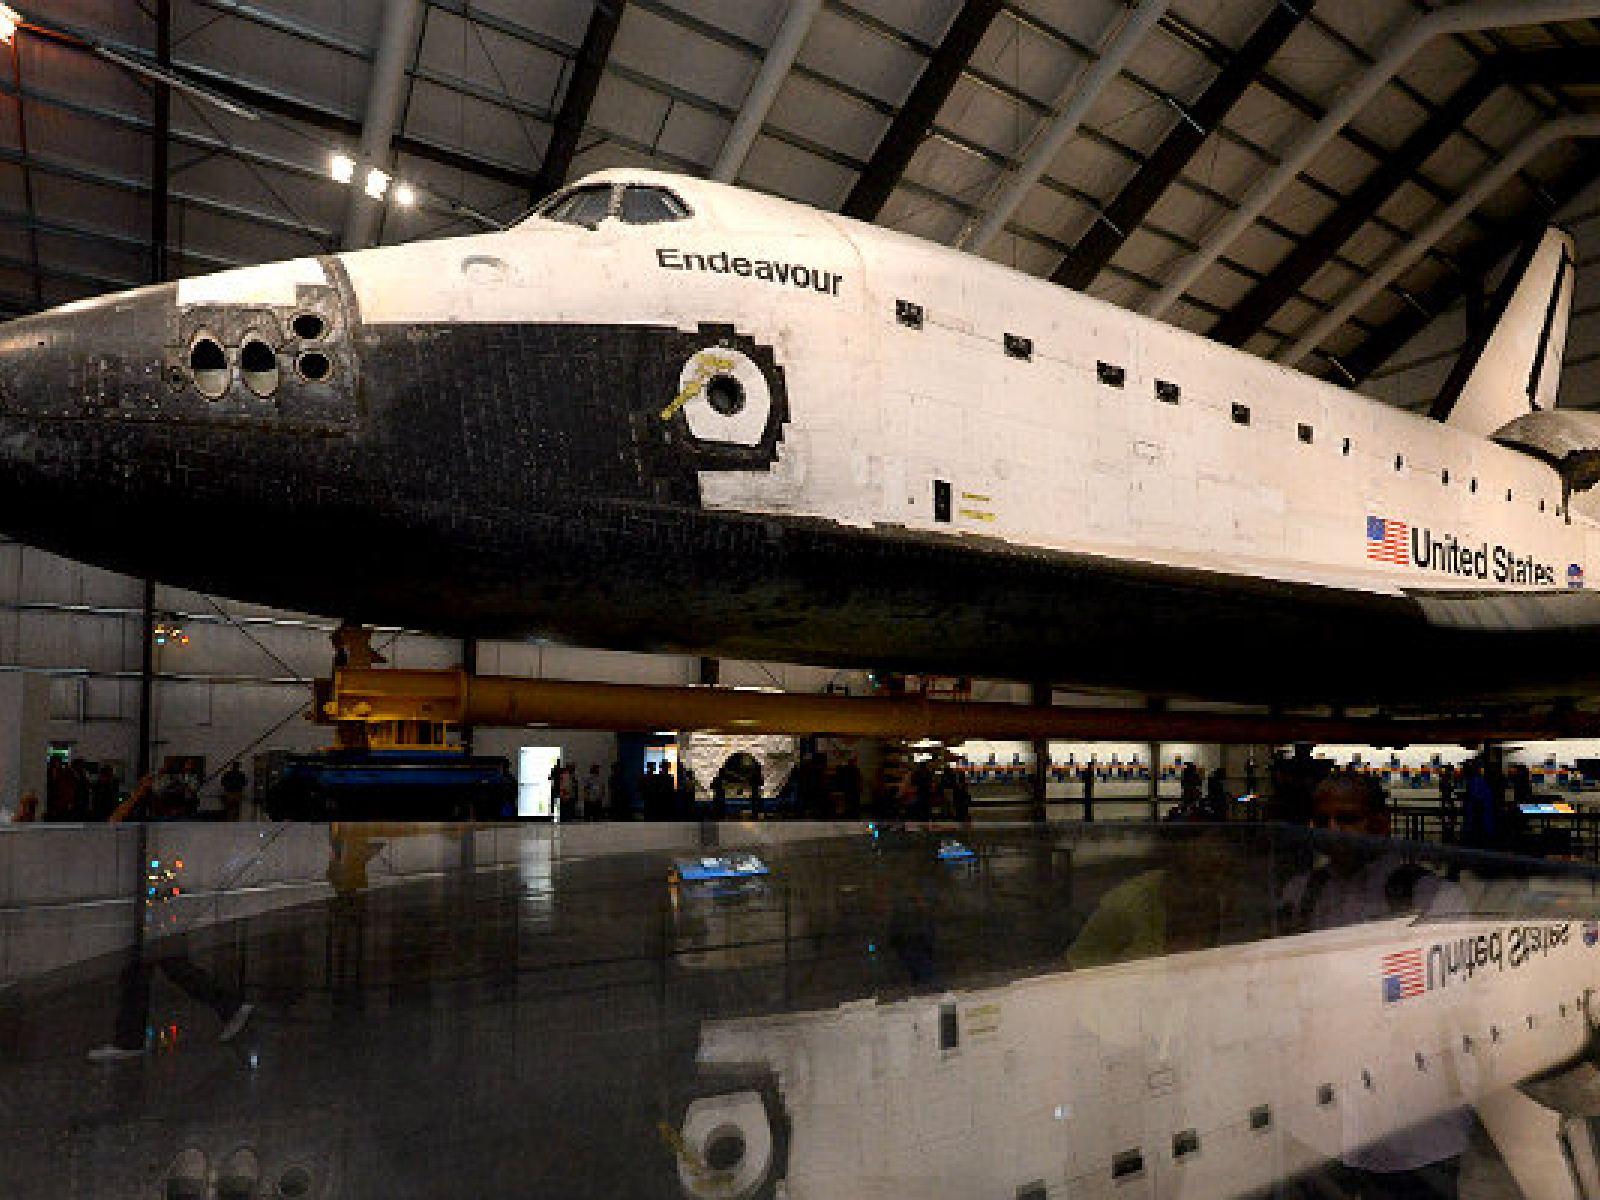 space shuttle programming language - photo #21